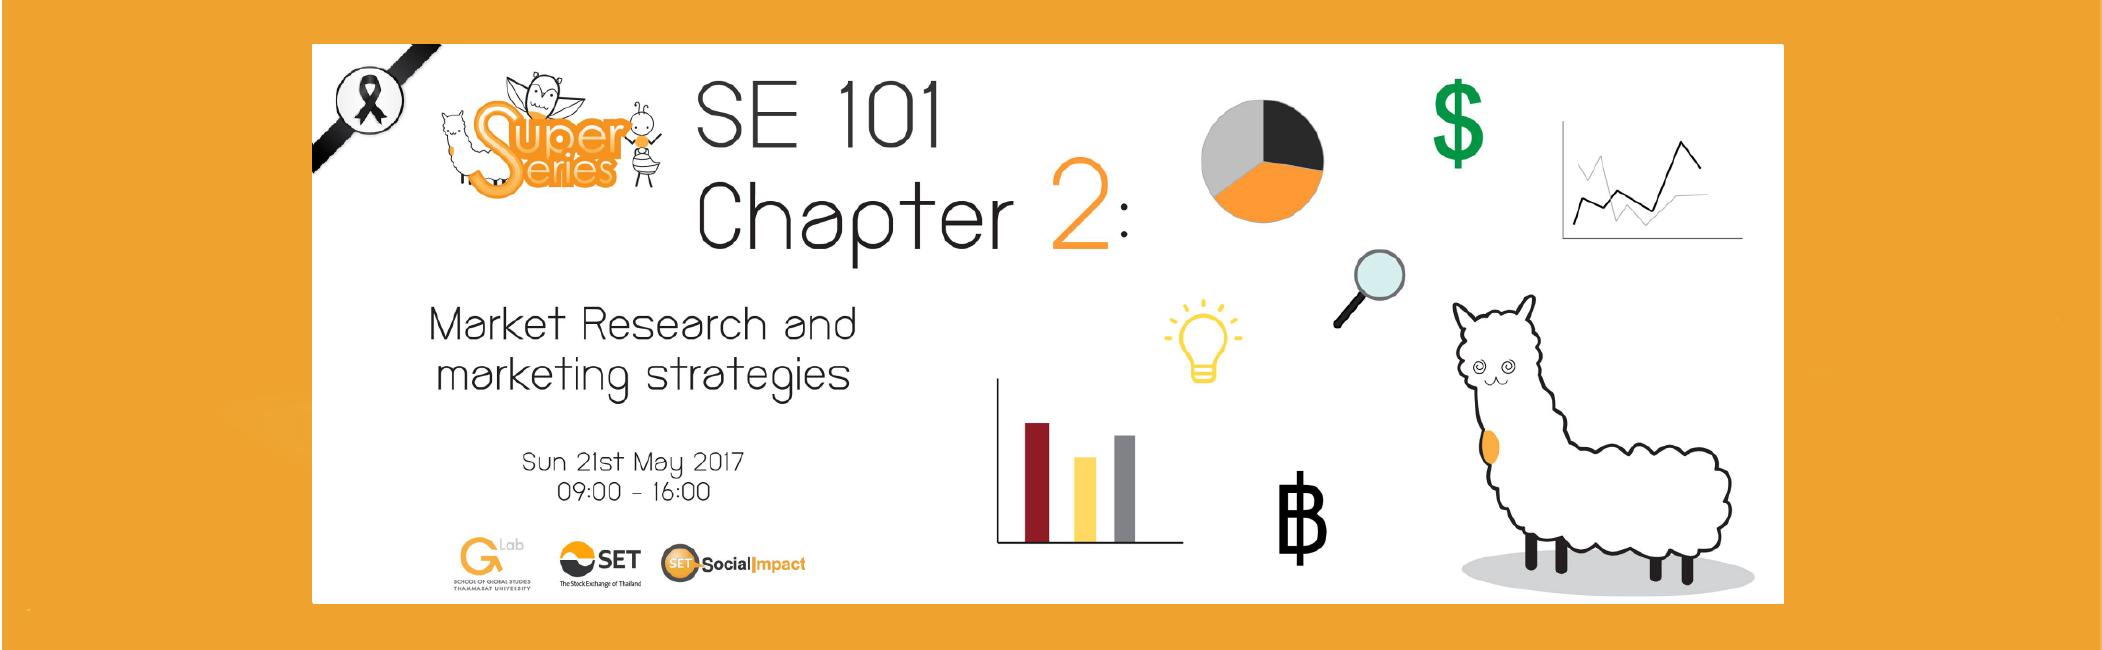 SE 101 Chapter 2